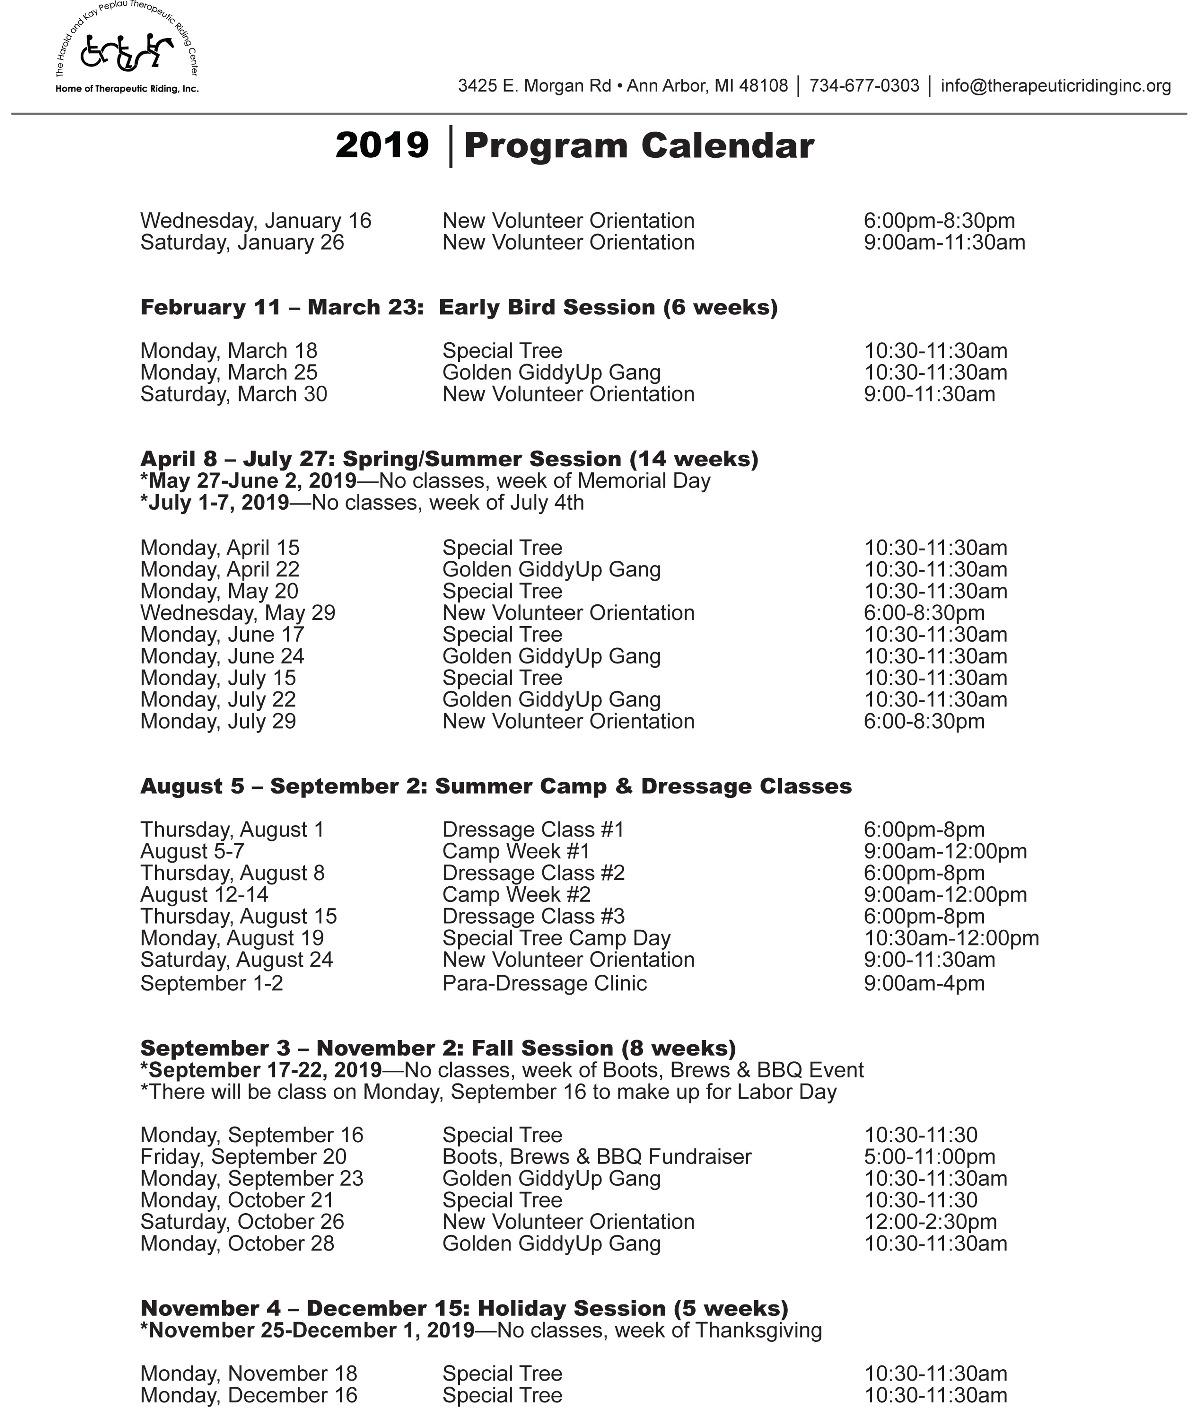 2019 Program Calendar.jpg